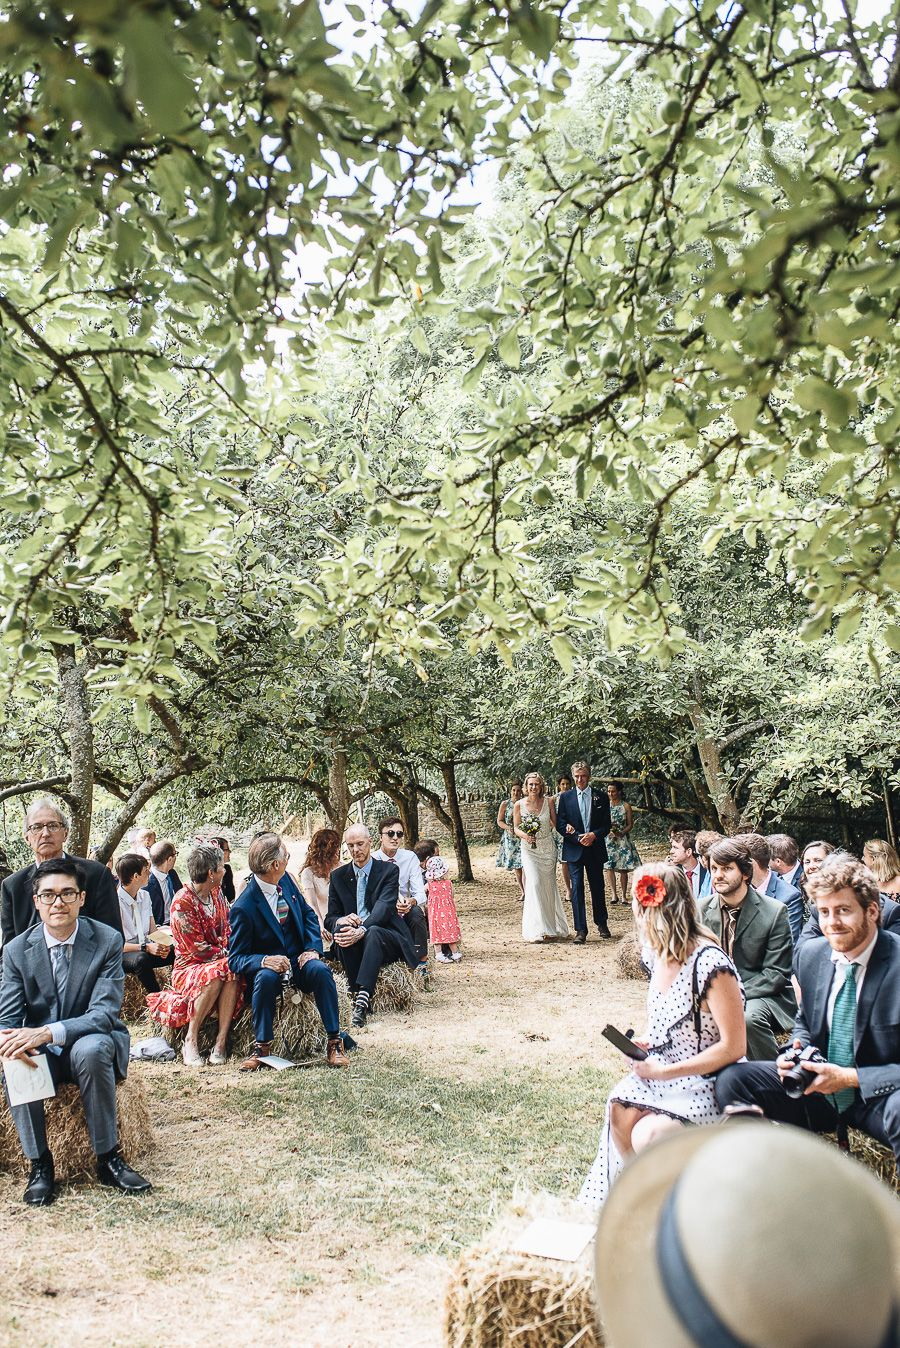 A Folly Farm Centre Wedding Folly farm, Adventure